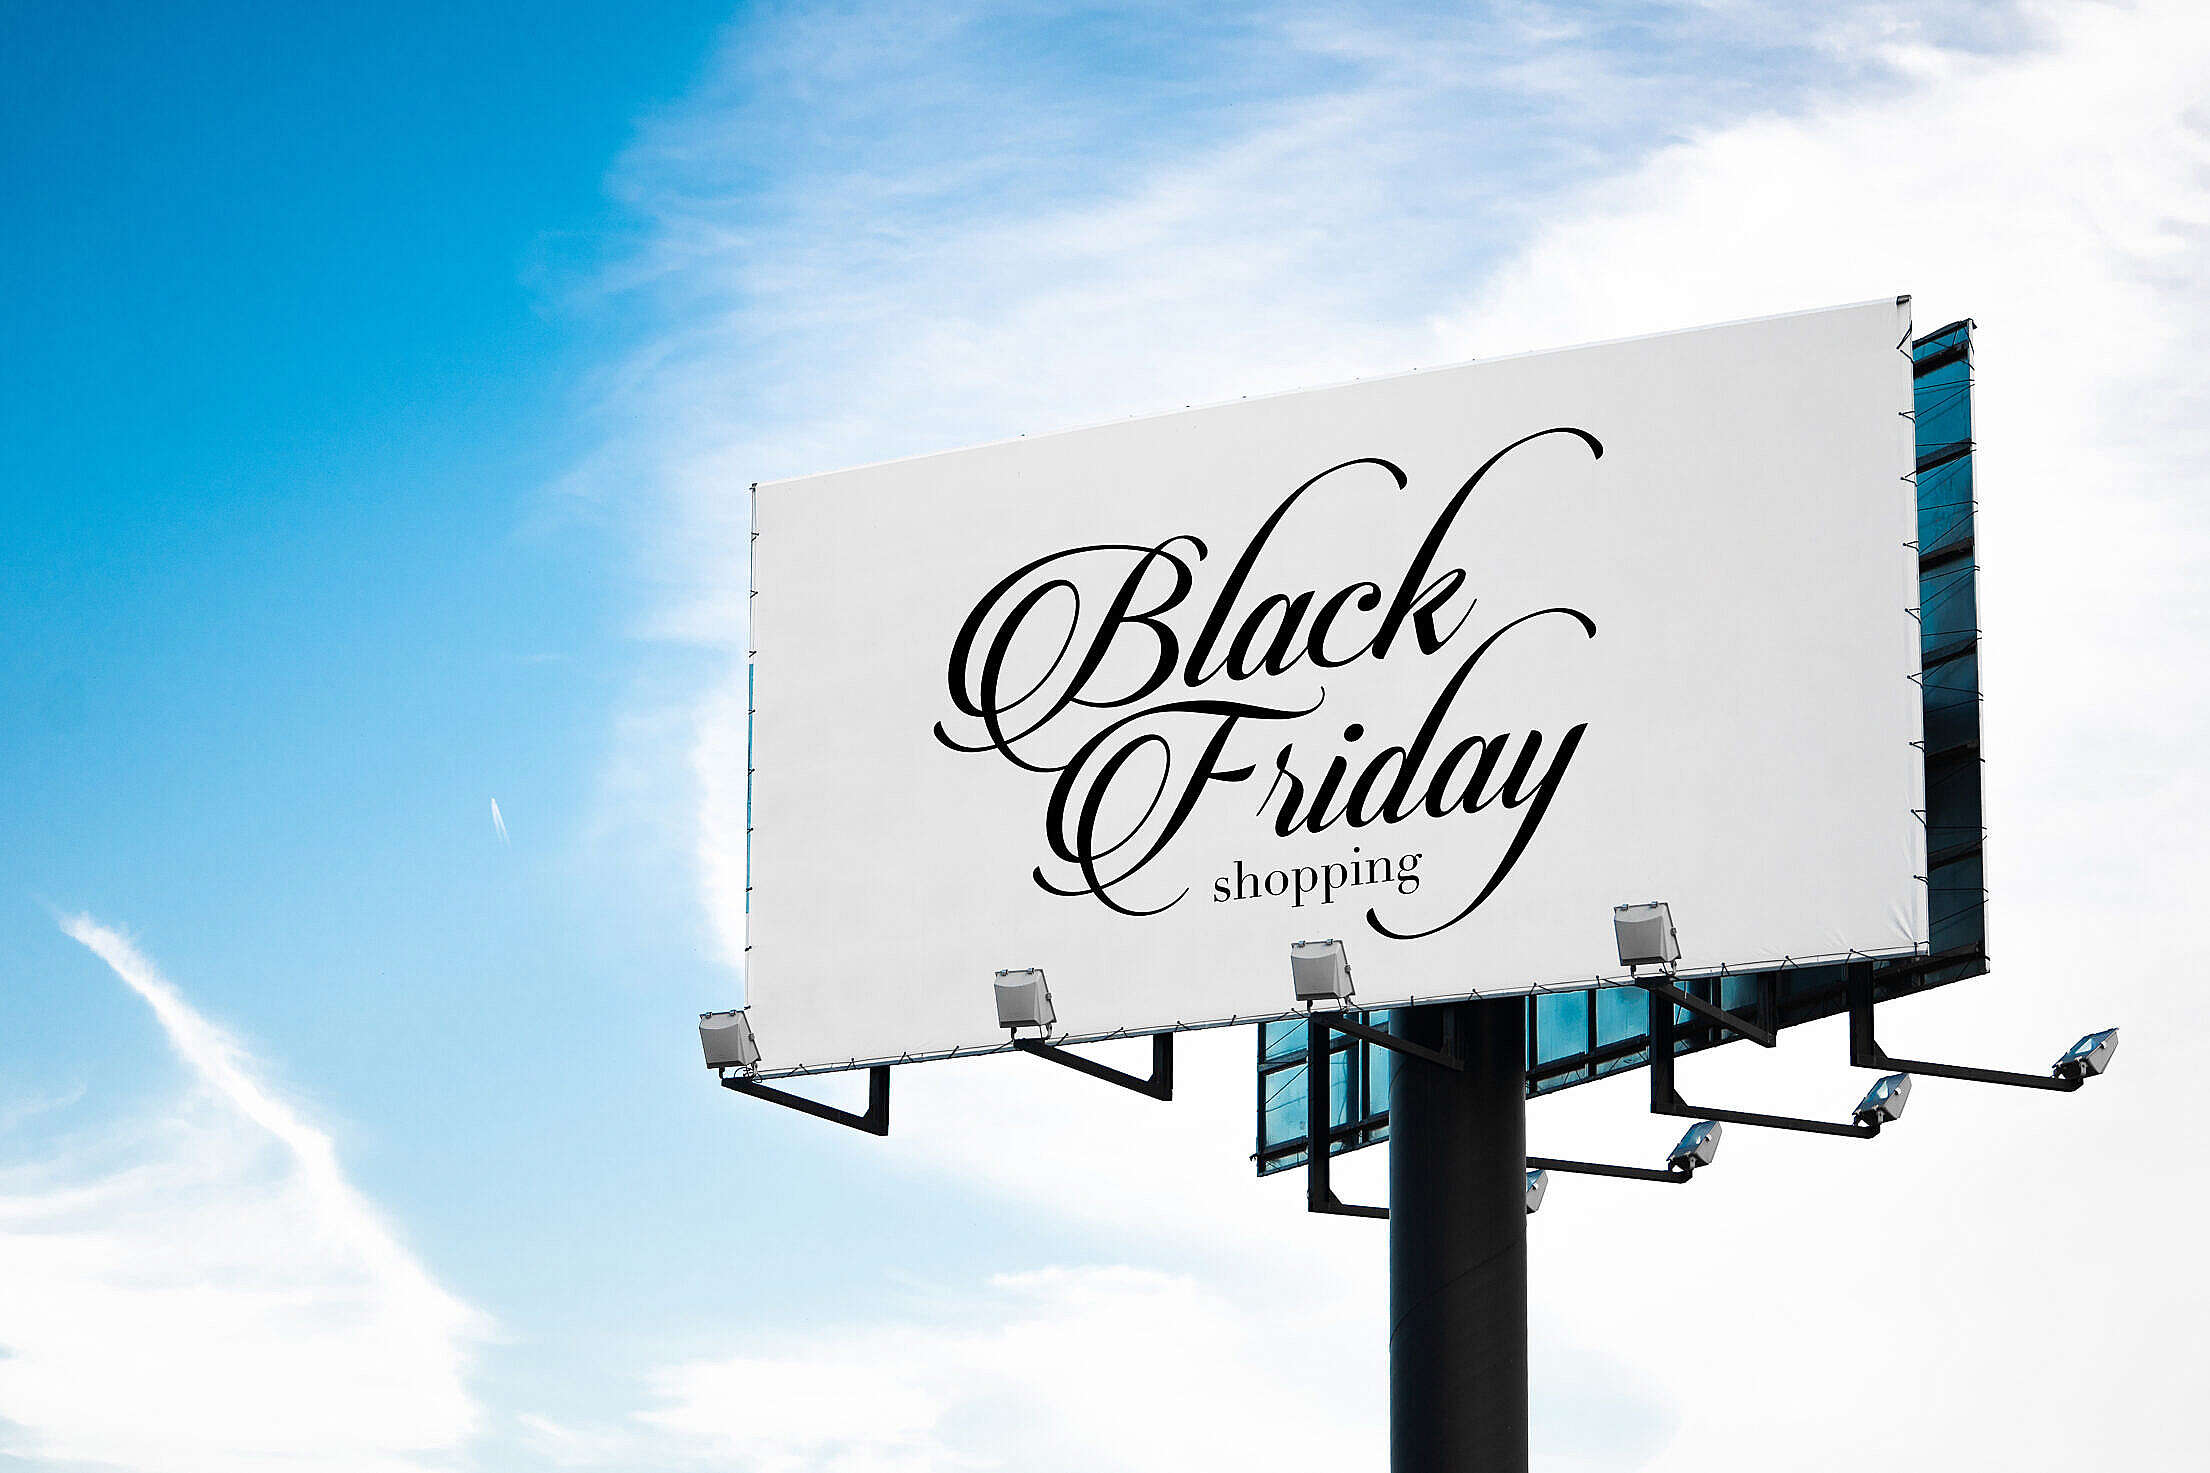 Black Friday Luxury Shopping Billboard Free Stock Photo